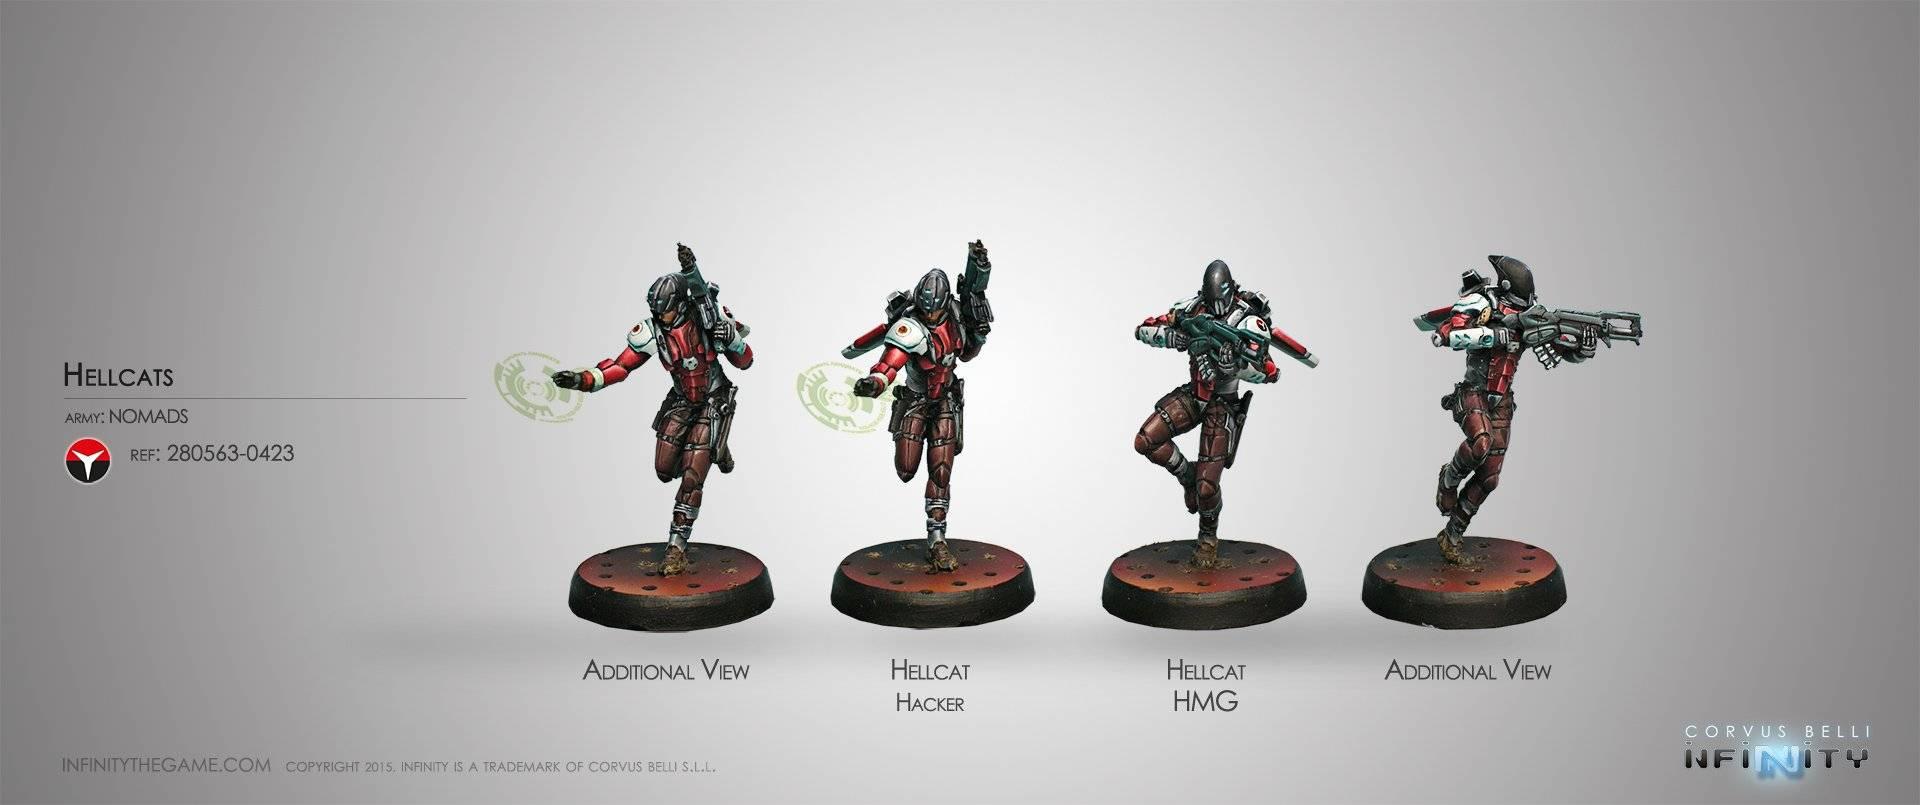 inf - nomads - hellcats (HMG/hacker)